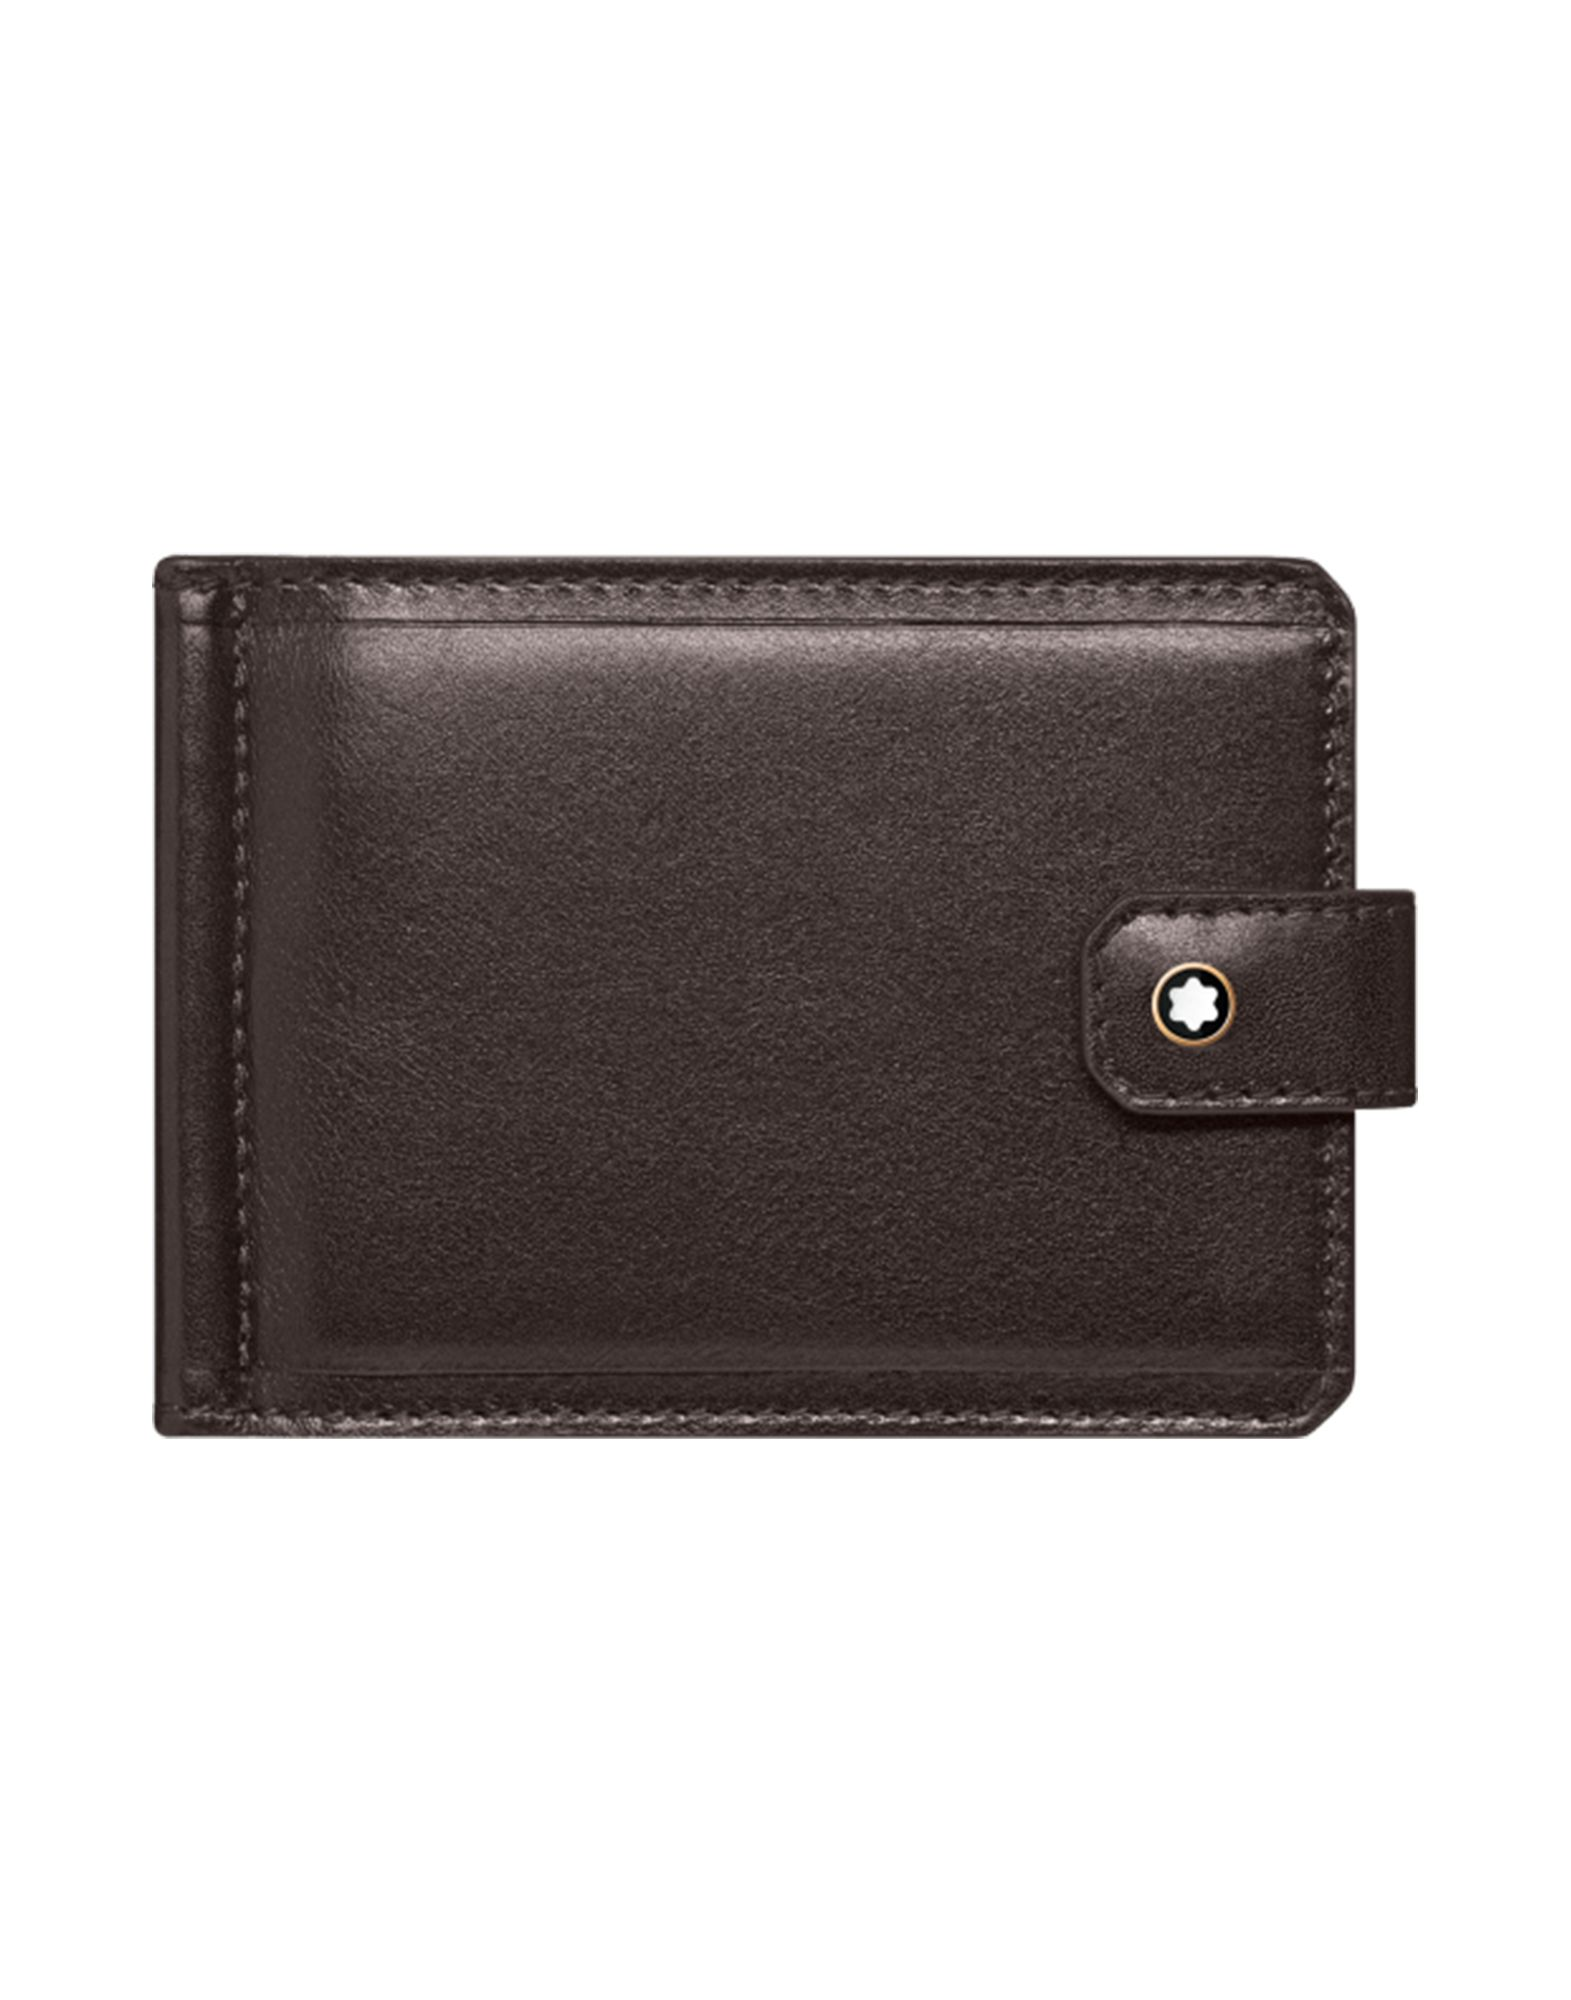 Portafoglio Montblanc 1926 Mb Heritage Wallet 6Cc Mclip S Dkbr - Donna - Acquista online su